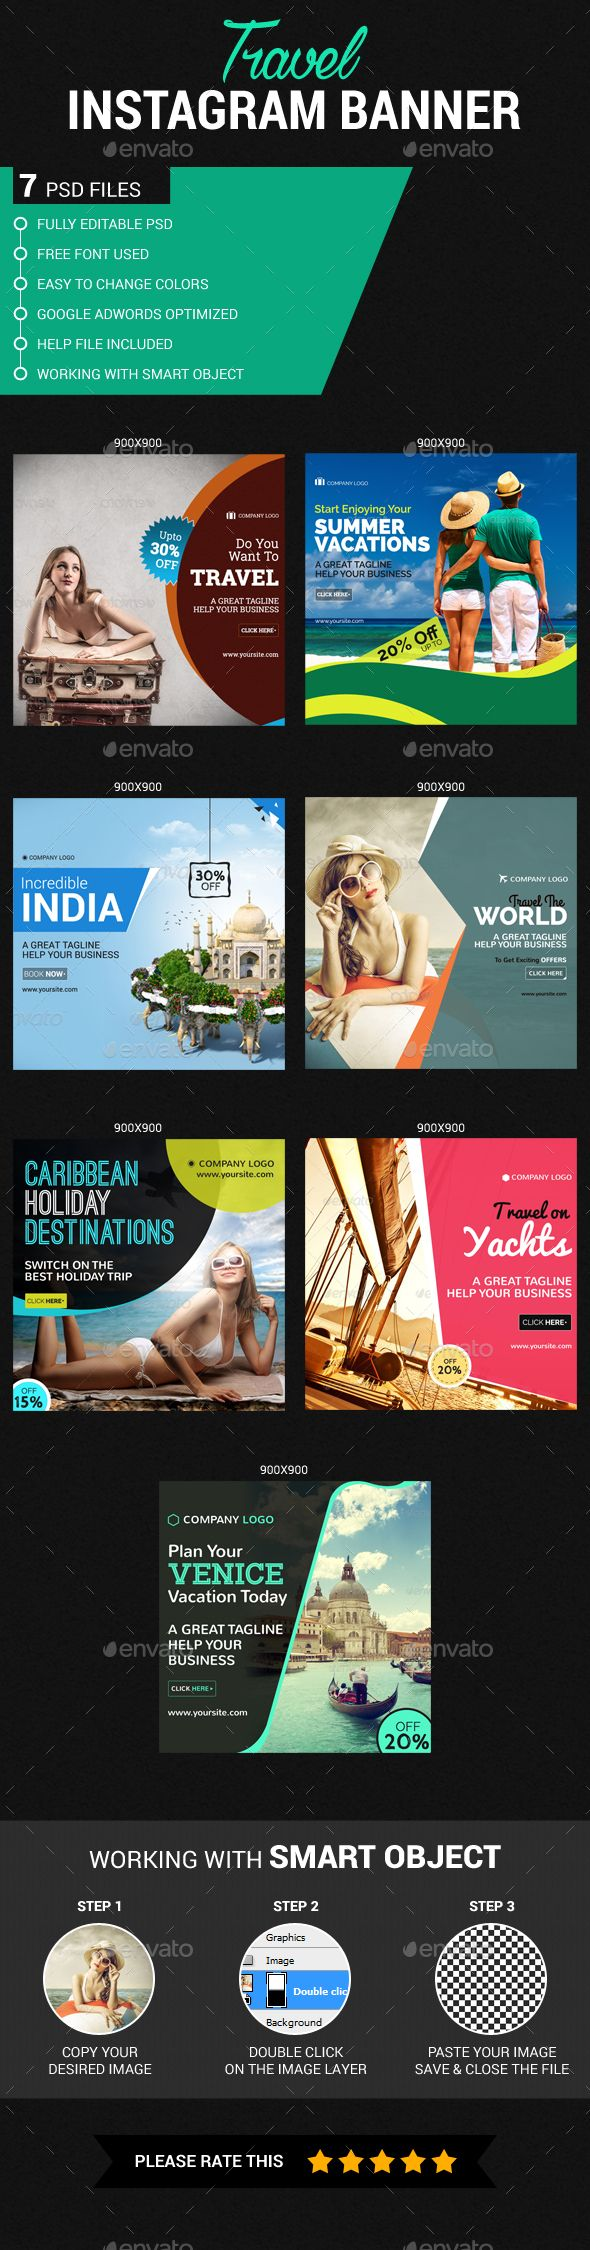 Travel Instagram Banner Template PSD #ads #promote Download: http://graphicriver.net/item/travel-instagram-banner/14410452?ref=ksioks